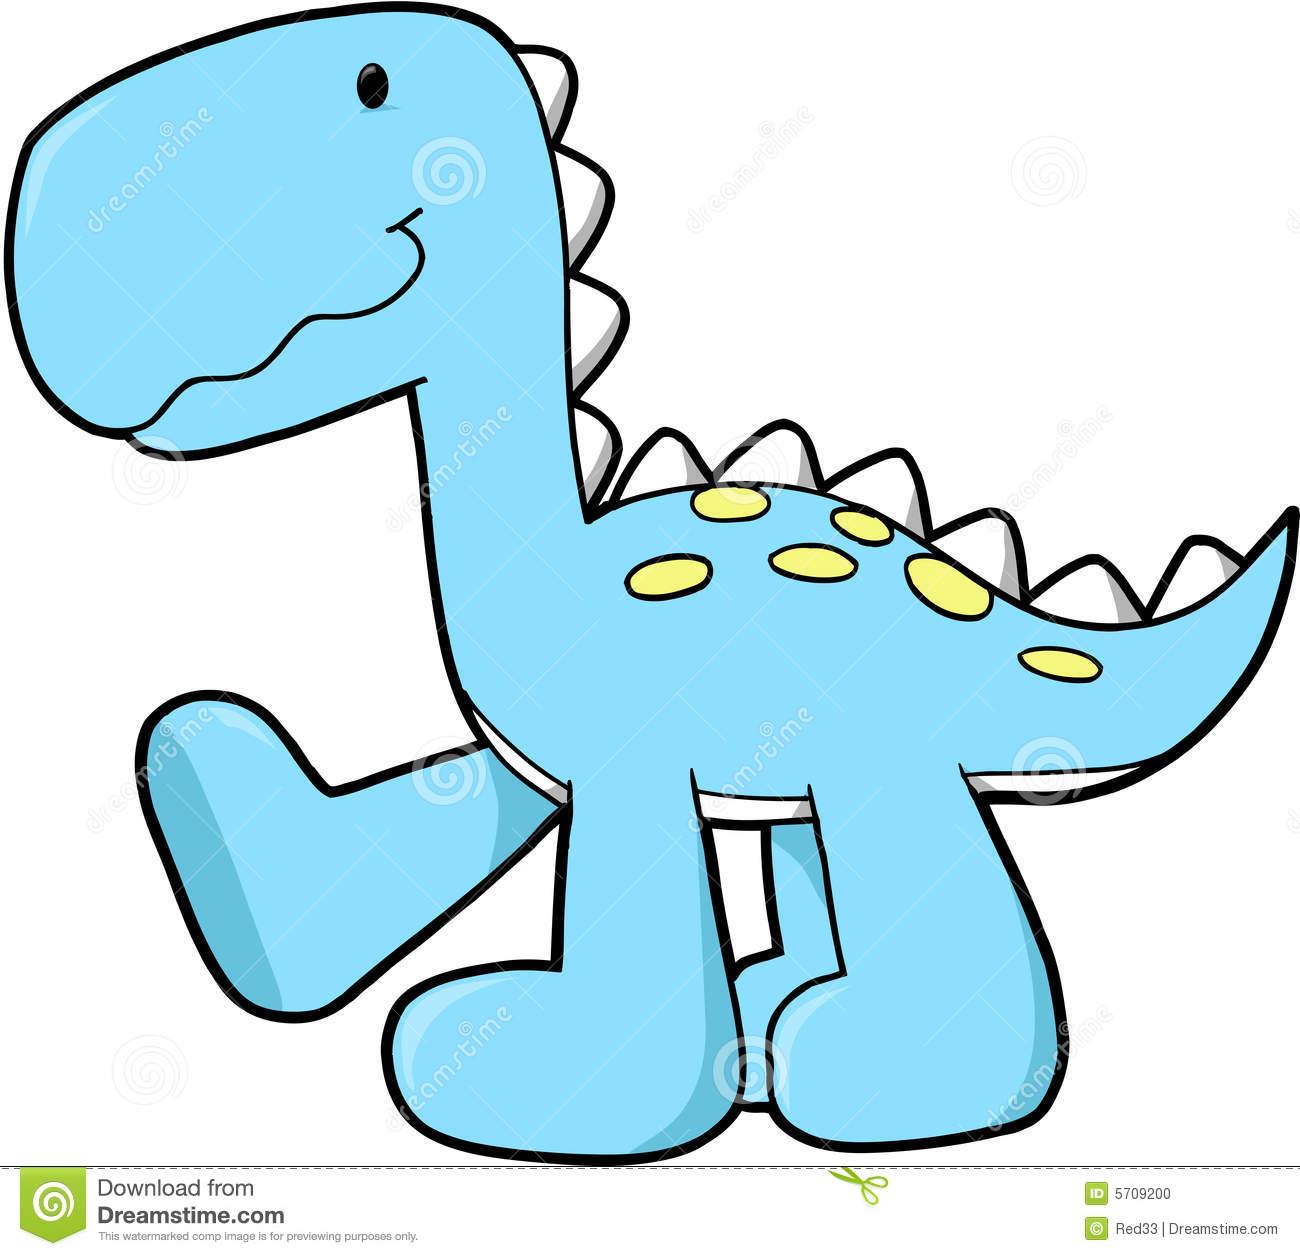 Cute dinosaur clipart 3 » Clipart Station.